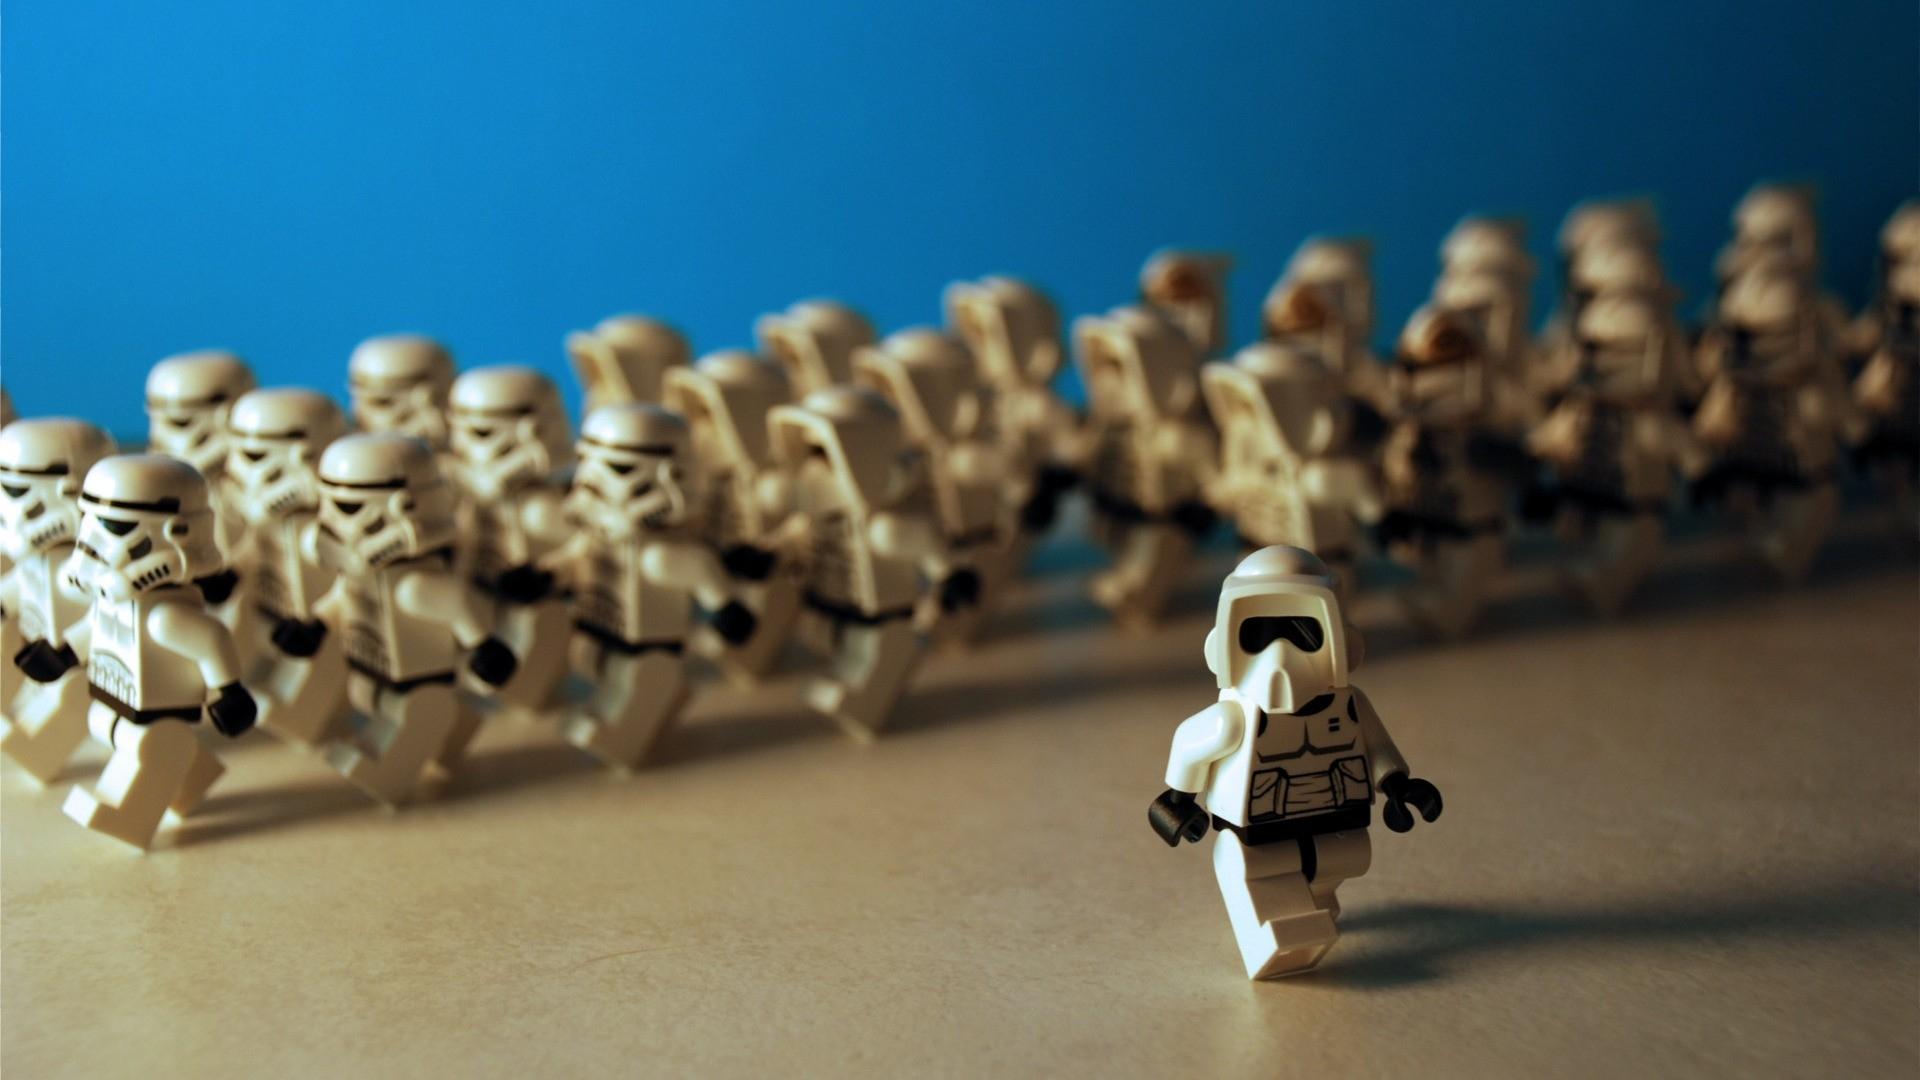 lego star wars ii: the original trilogy full hd wallpaper and